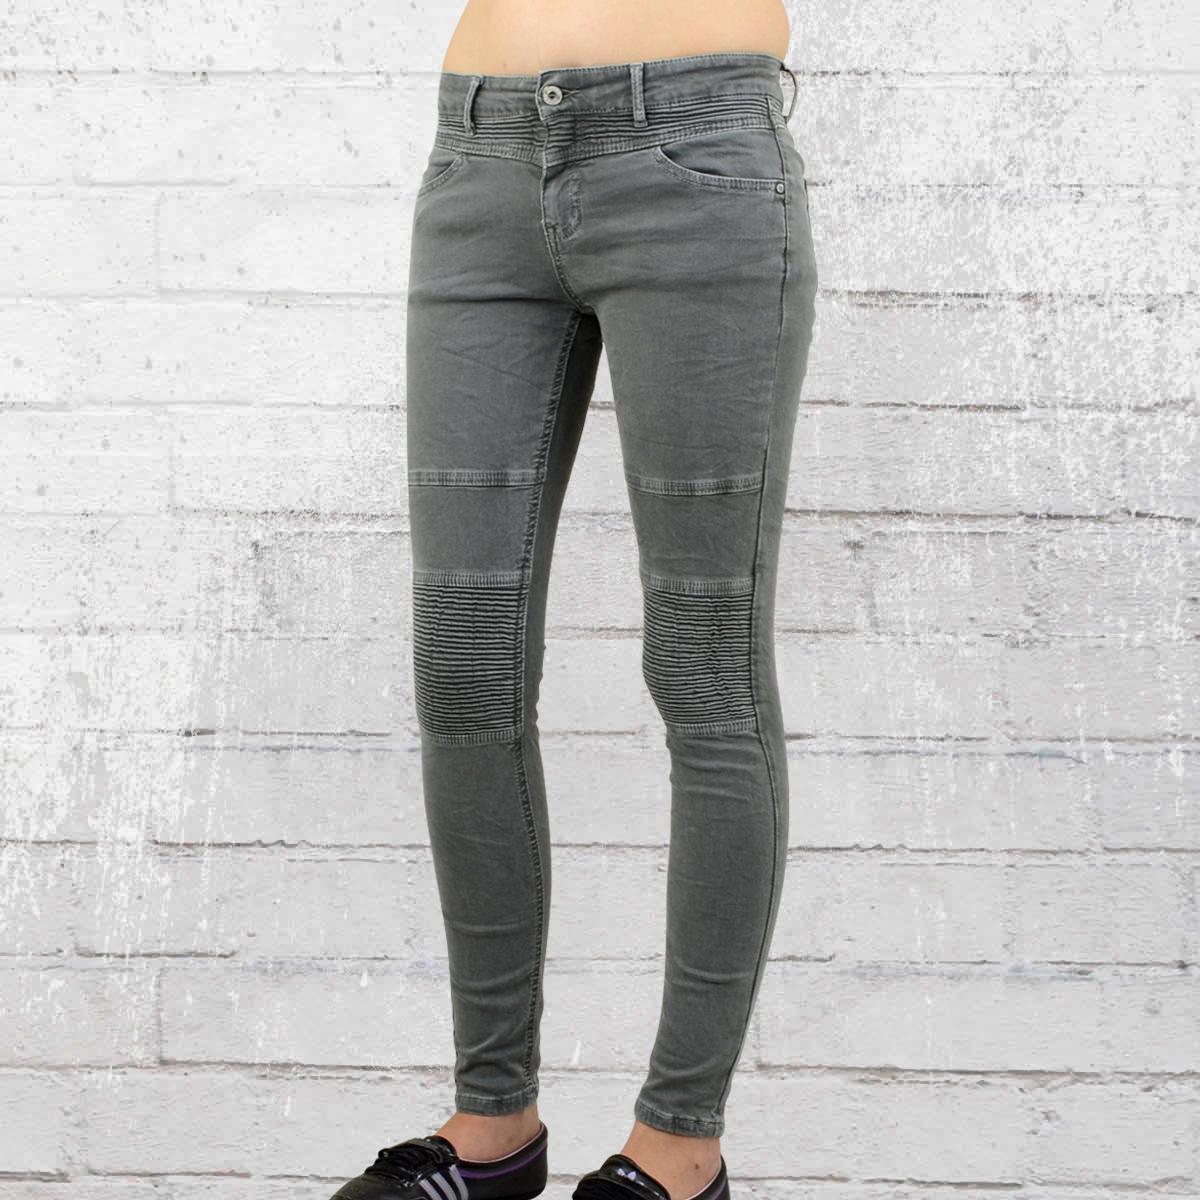 jetzt bestellen monday afternoon damen stretch jeans. Black Bedroom Furniture Sets. Home Design Ideas